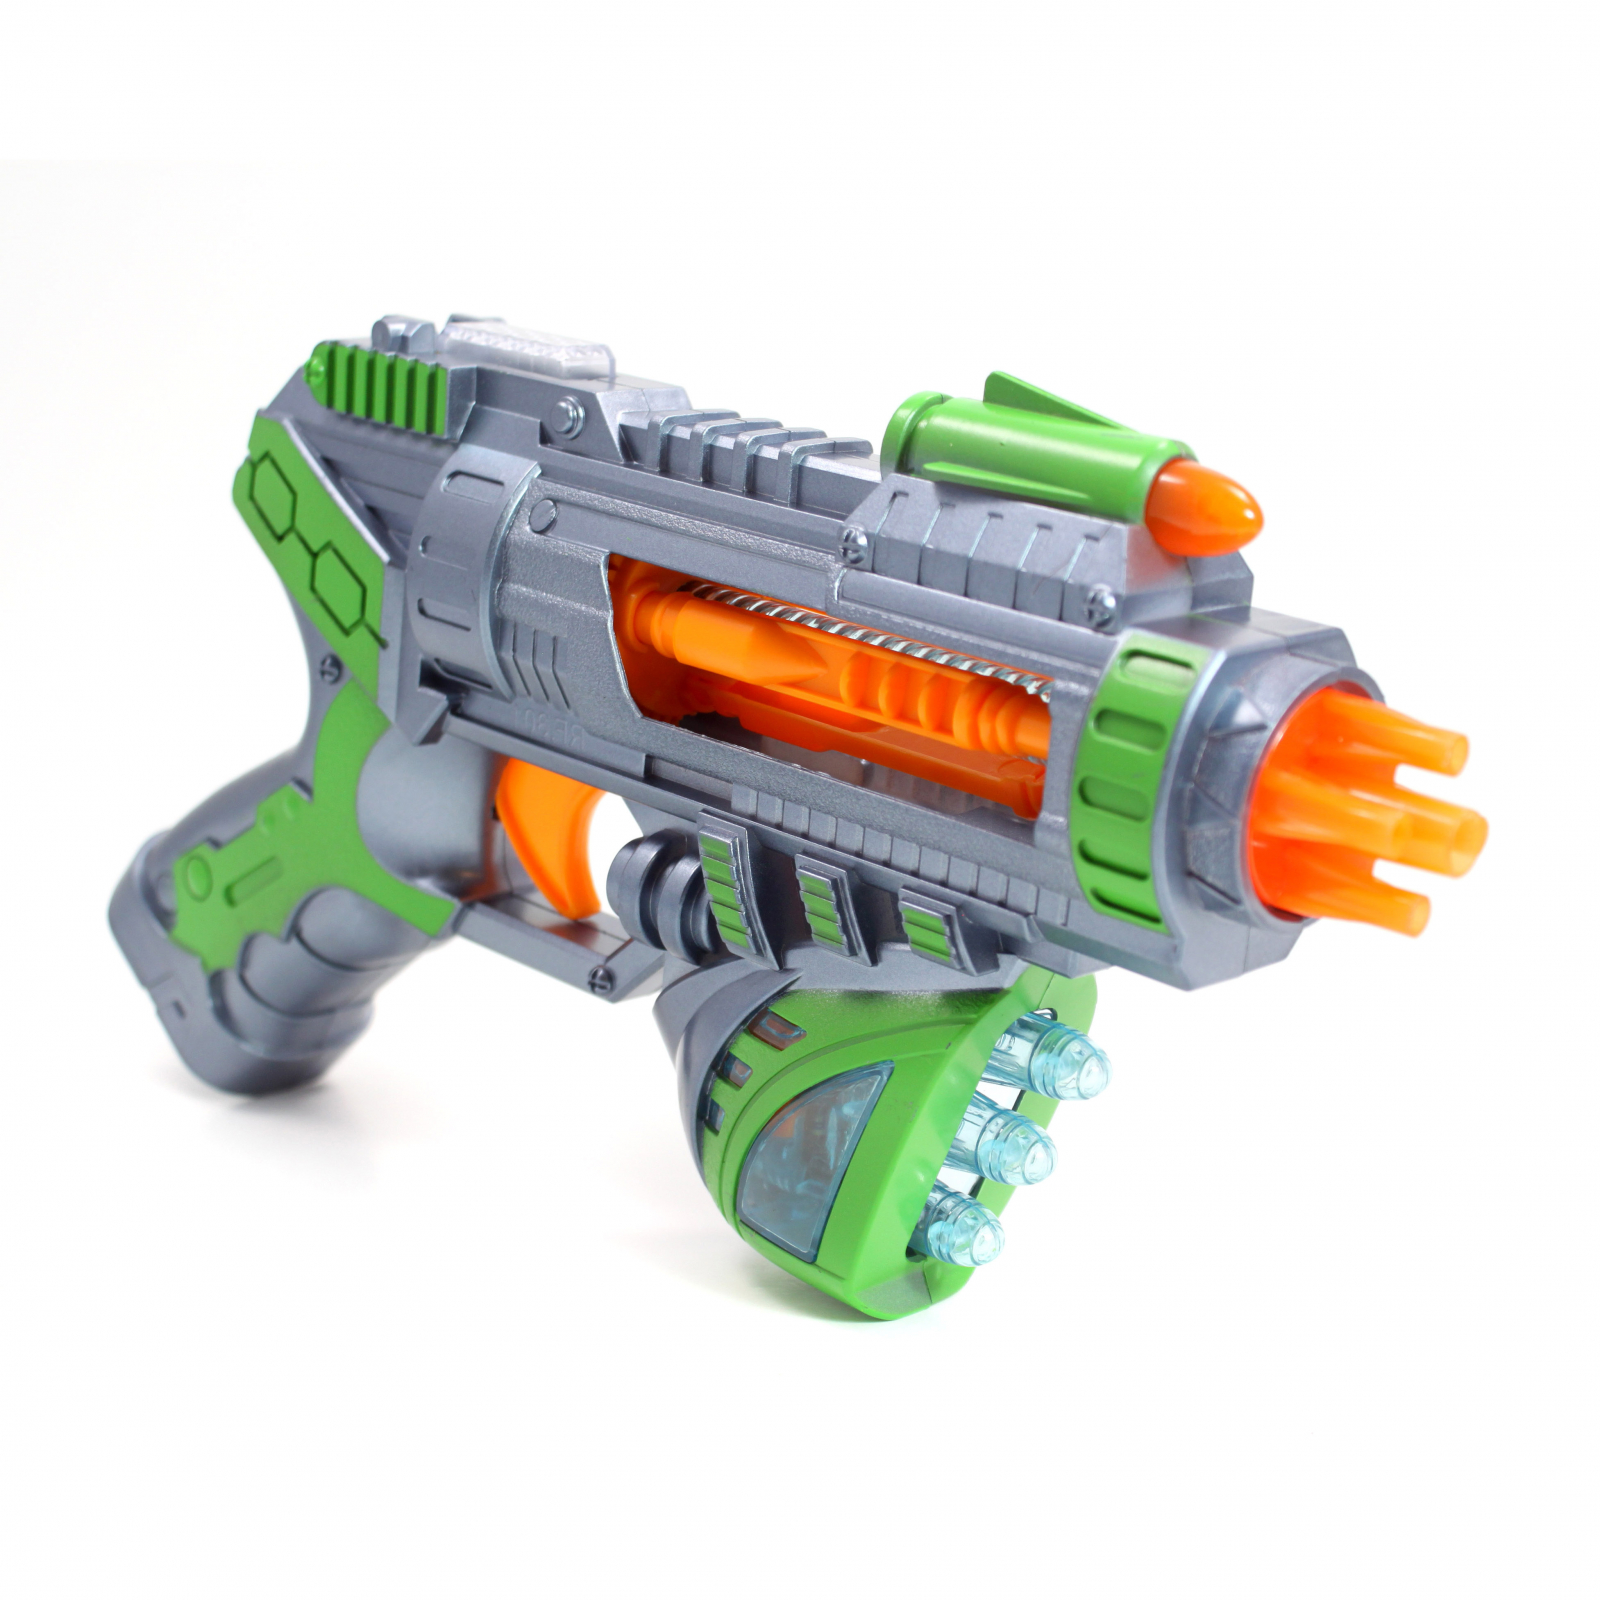 Kidplokio Superhero Galaxy Space Sonic Blaster Toy Gun Green